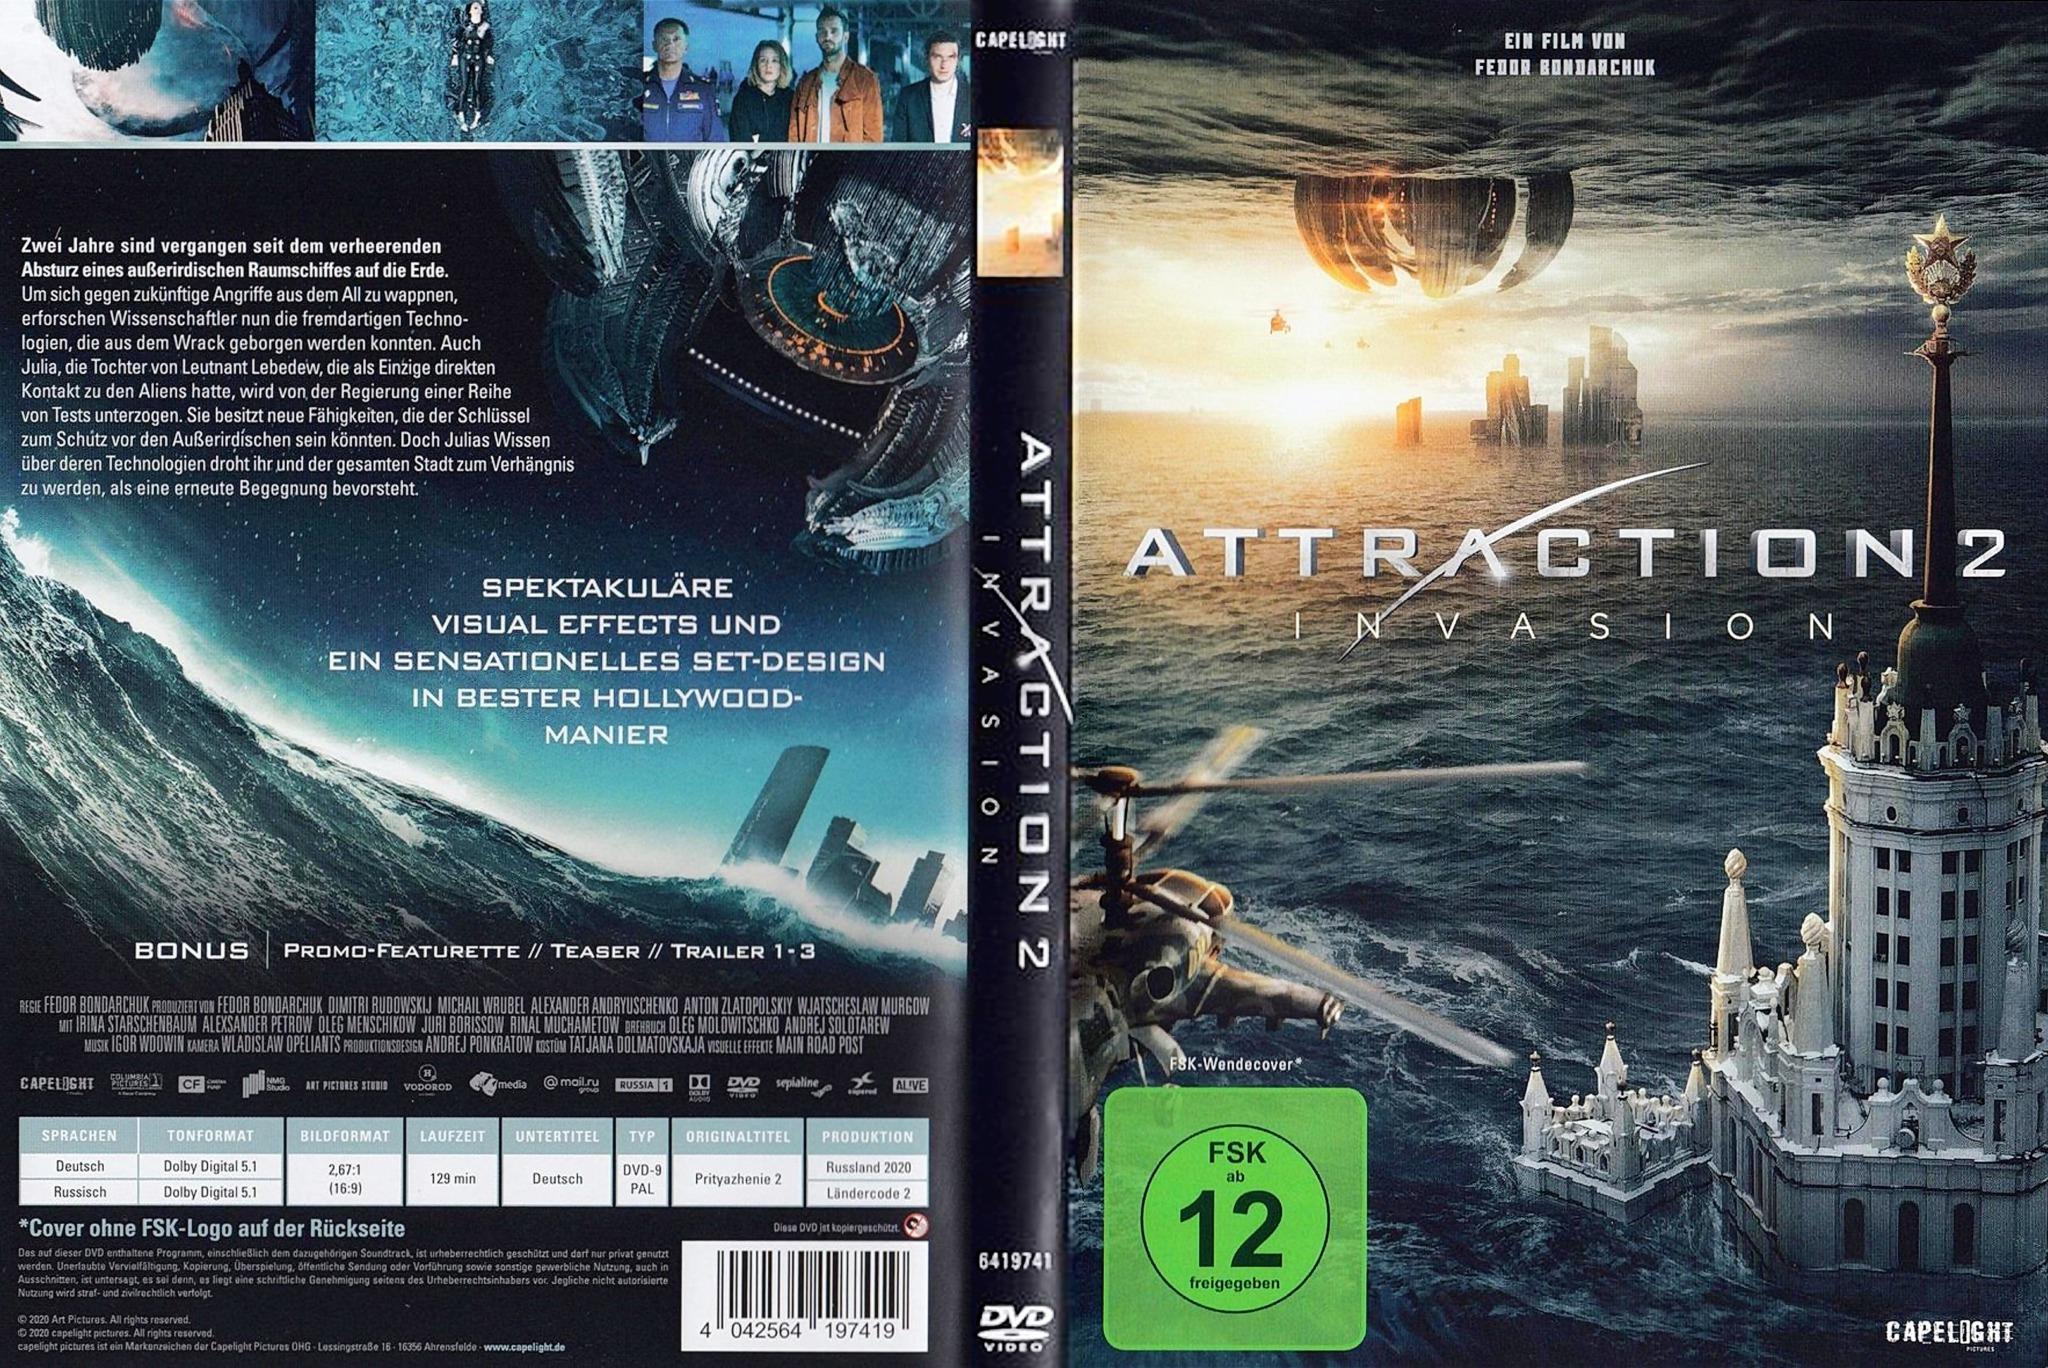 Attraction 2 Invasion 2020 Todo Sobre Cine